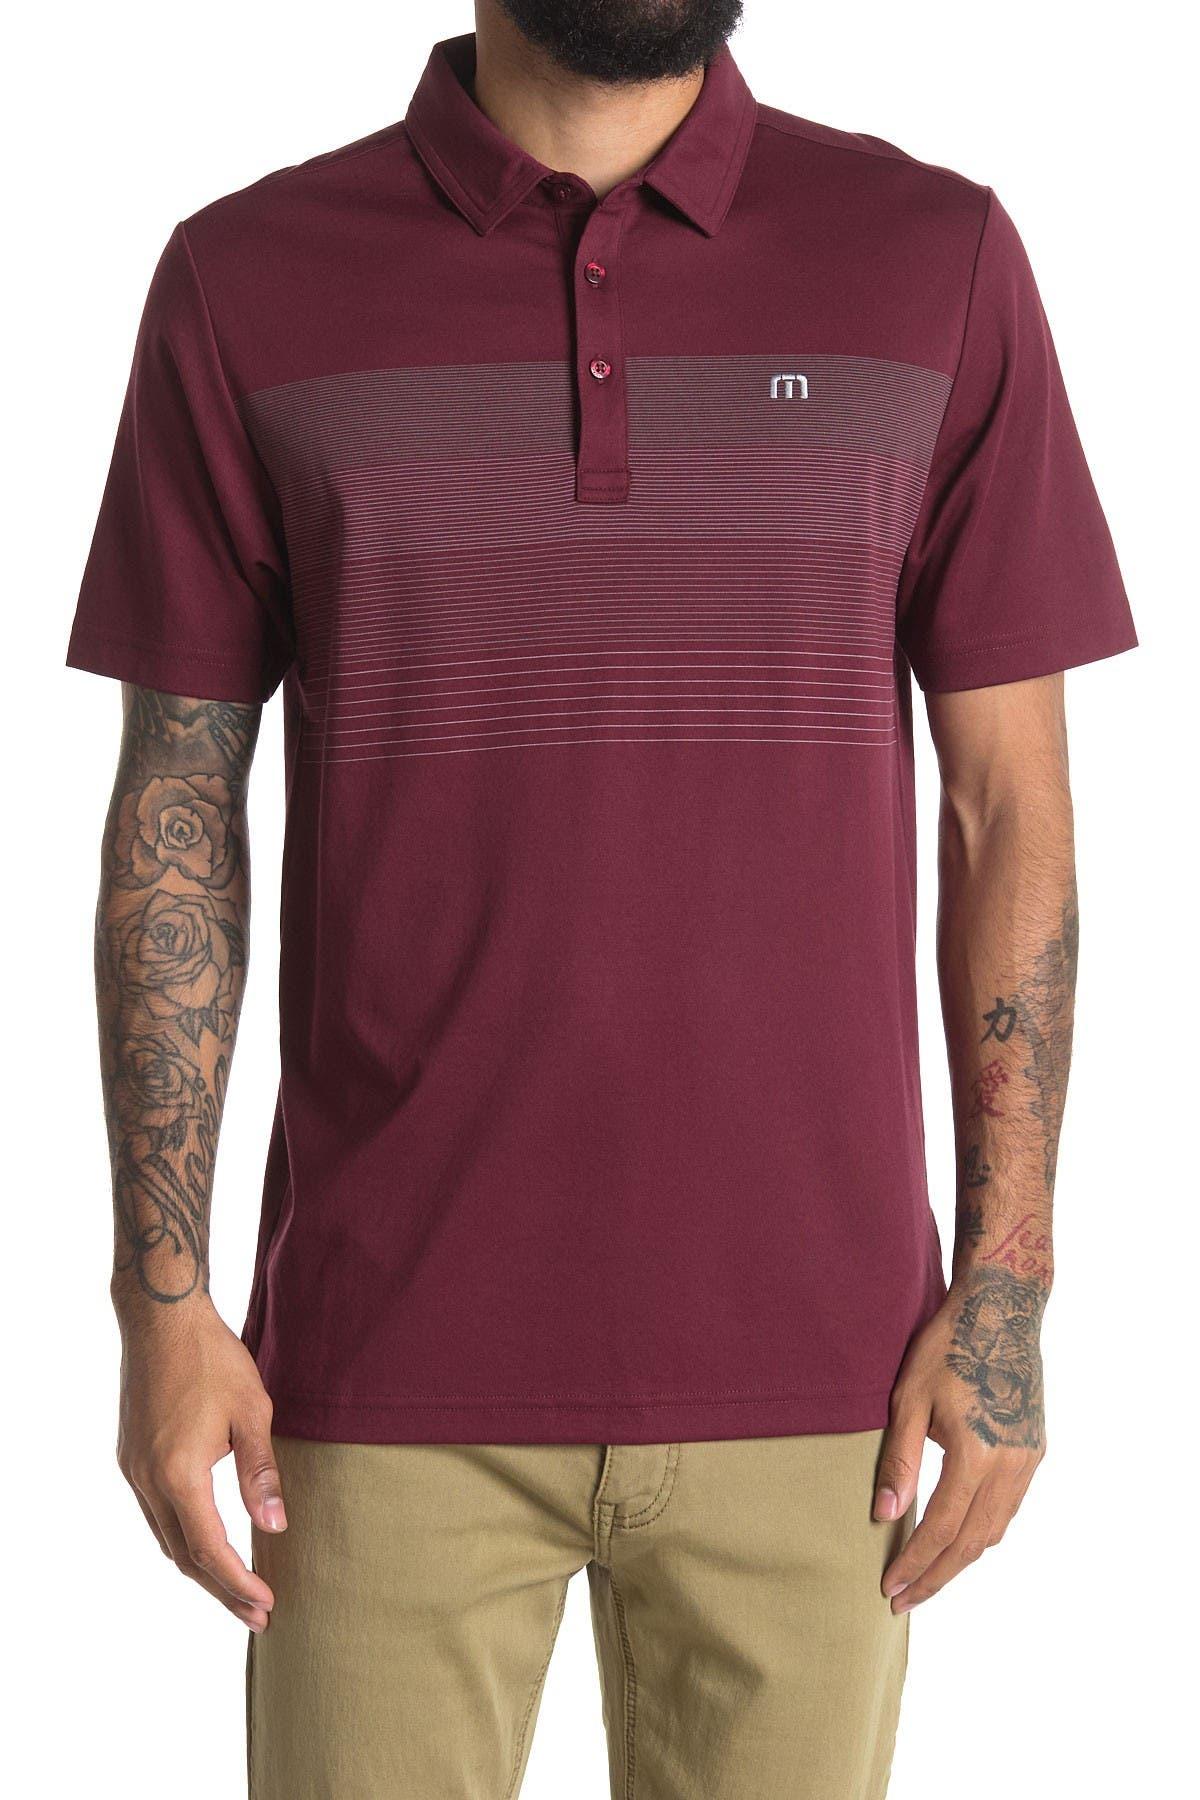 Image of TRAVIS MATHEW Open to Buy Short Sleeve Polo